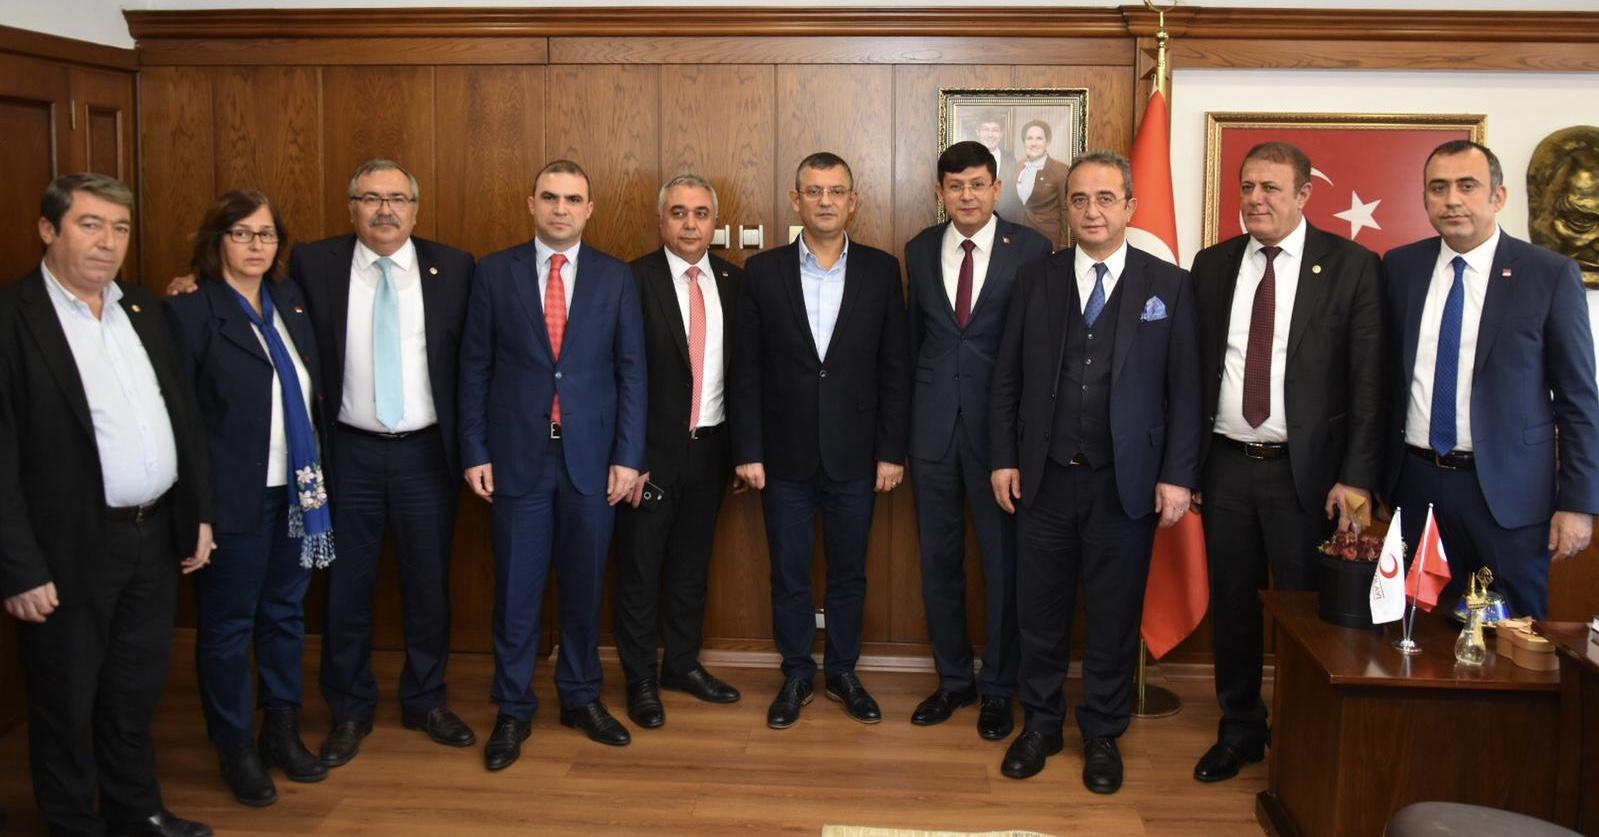 CHP'nin kurmaylarından Başkan Özcan'a ziyaret